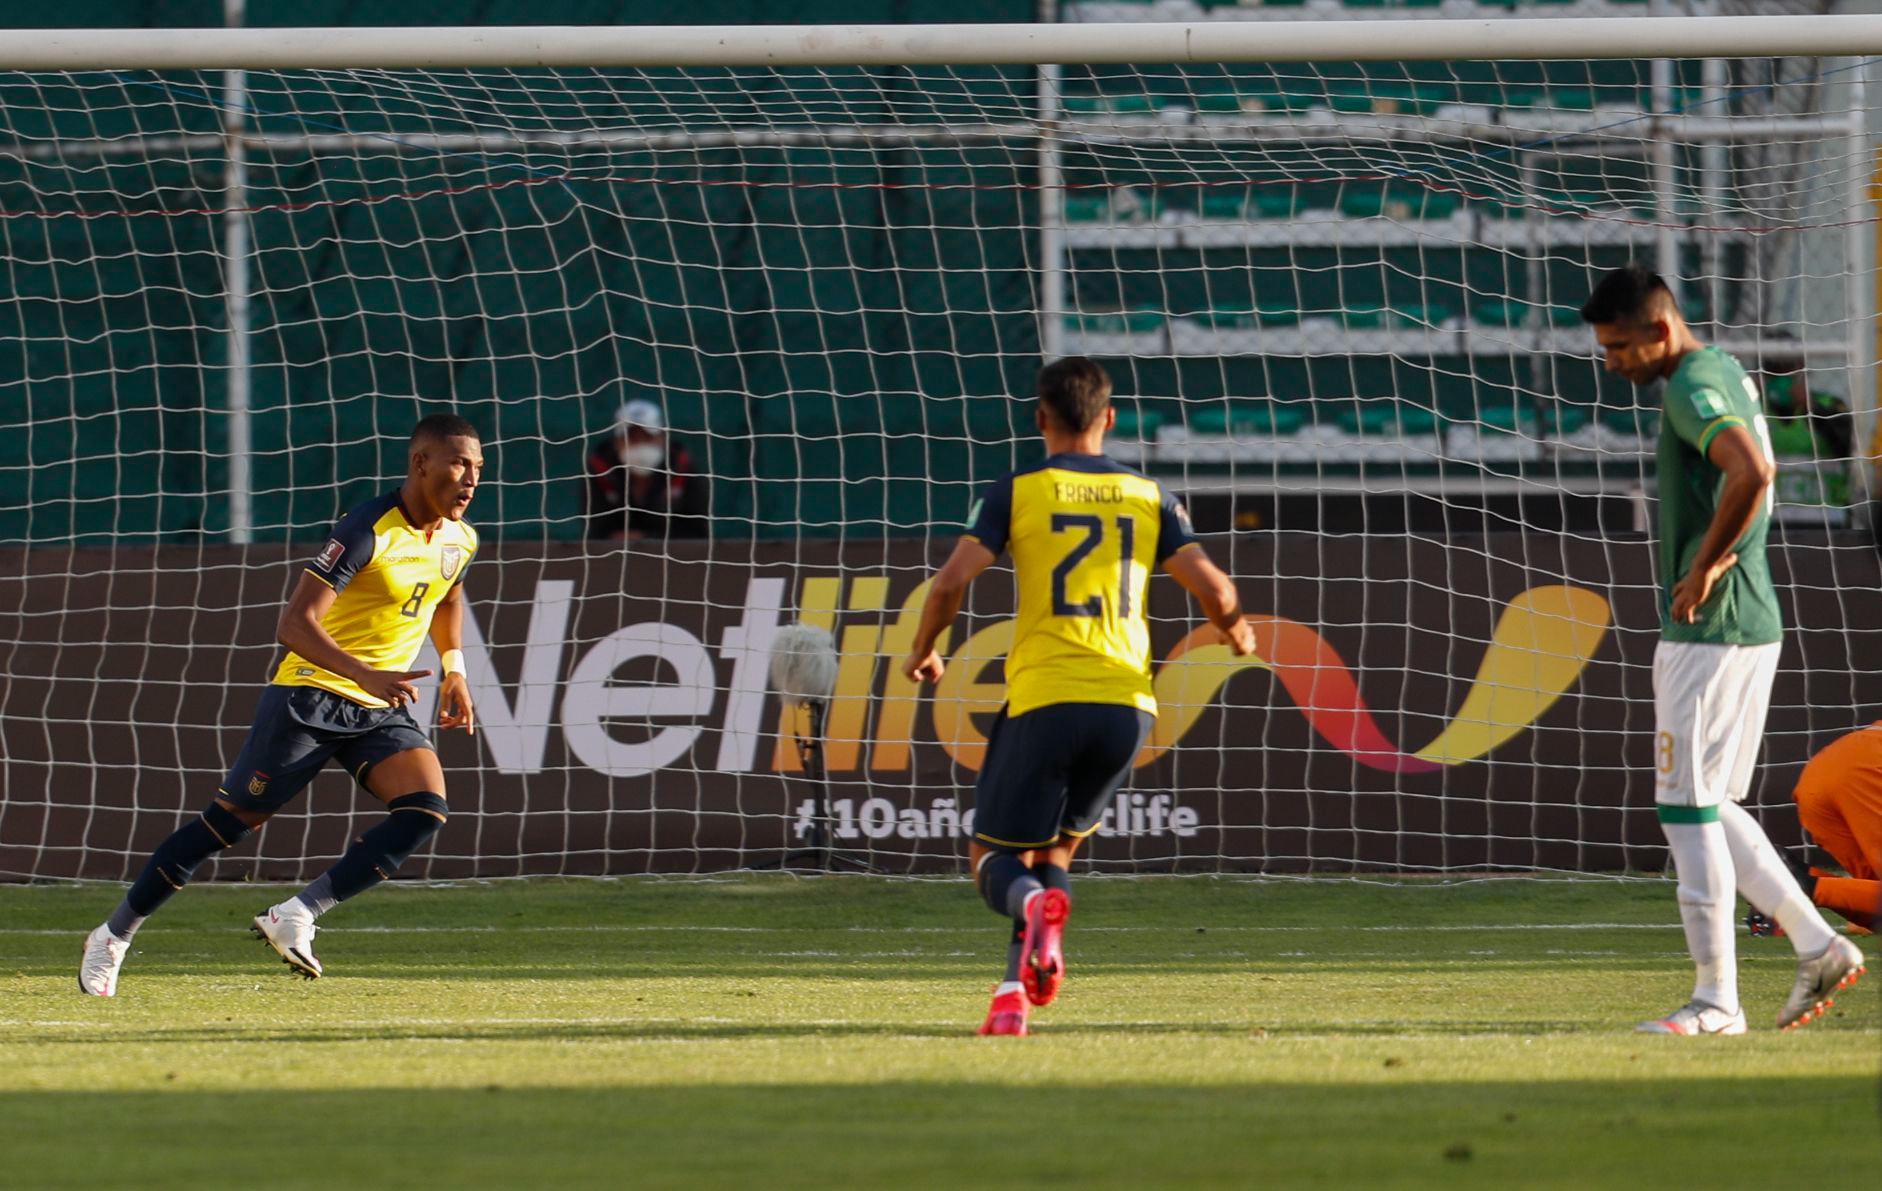 Eliminatorias sudamericanas: revive los goles de Ecuador ante Bolivia